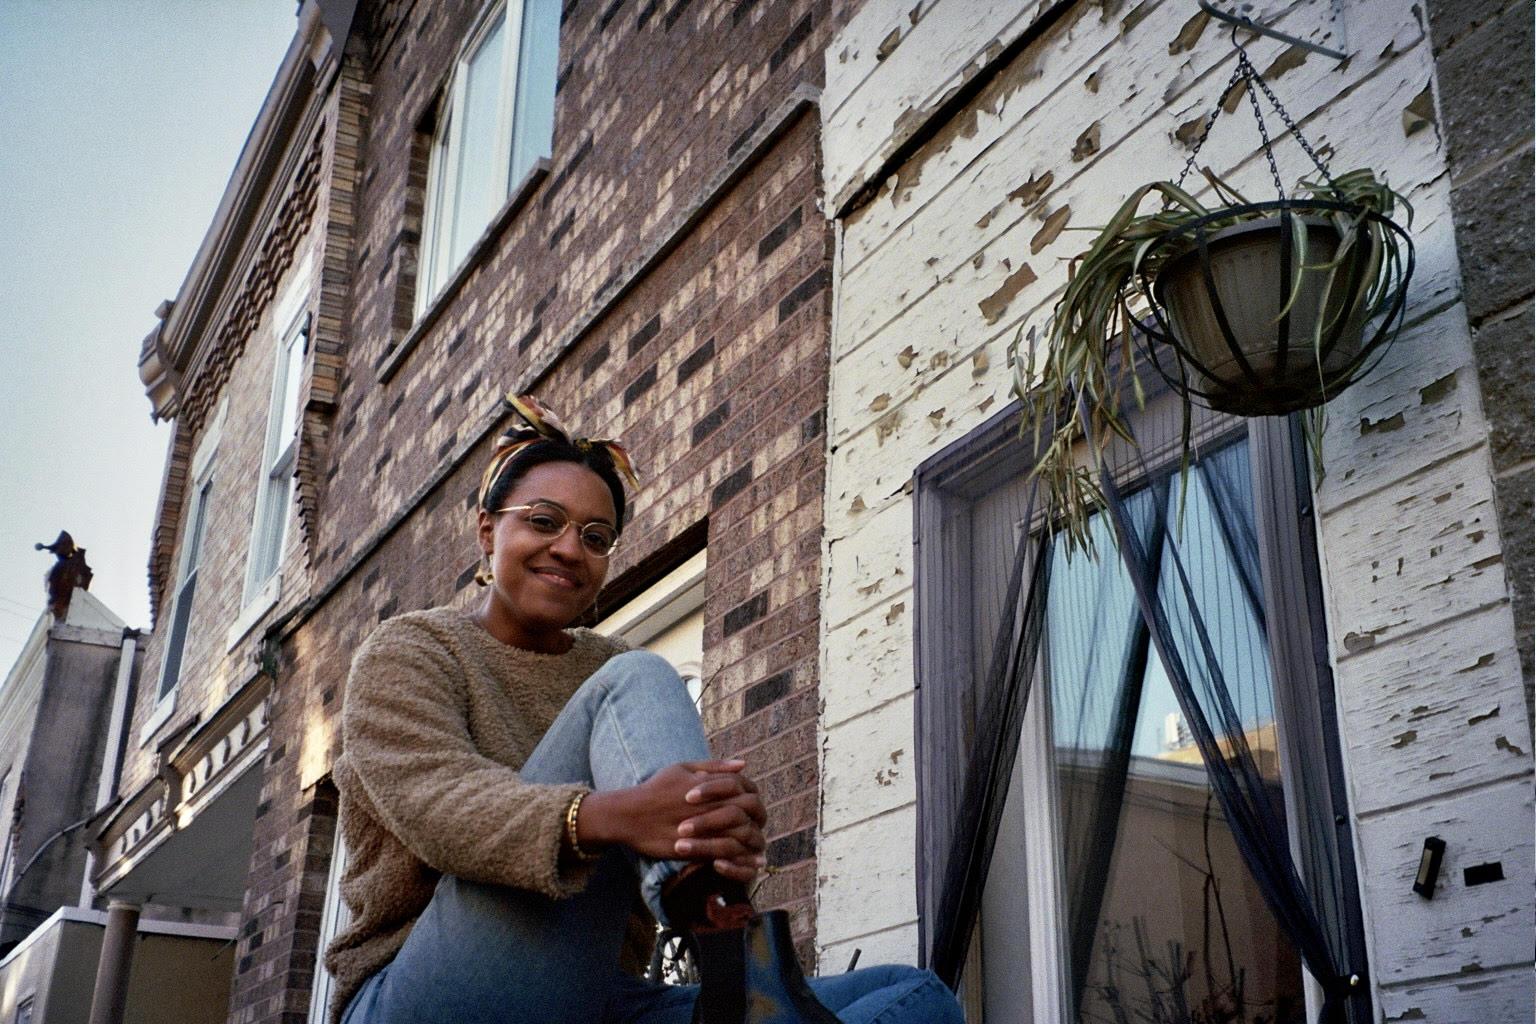 Felicia sitting on the steps near an apartment